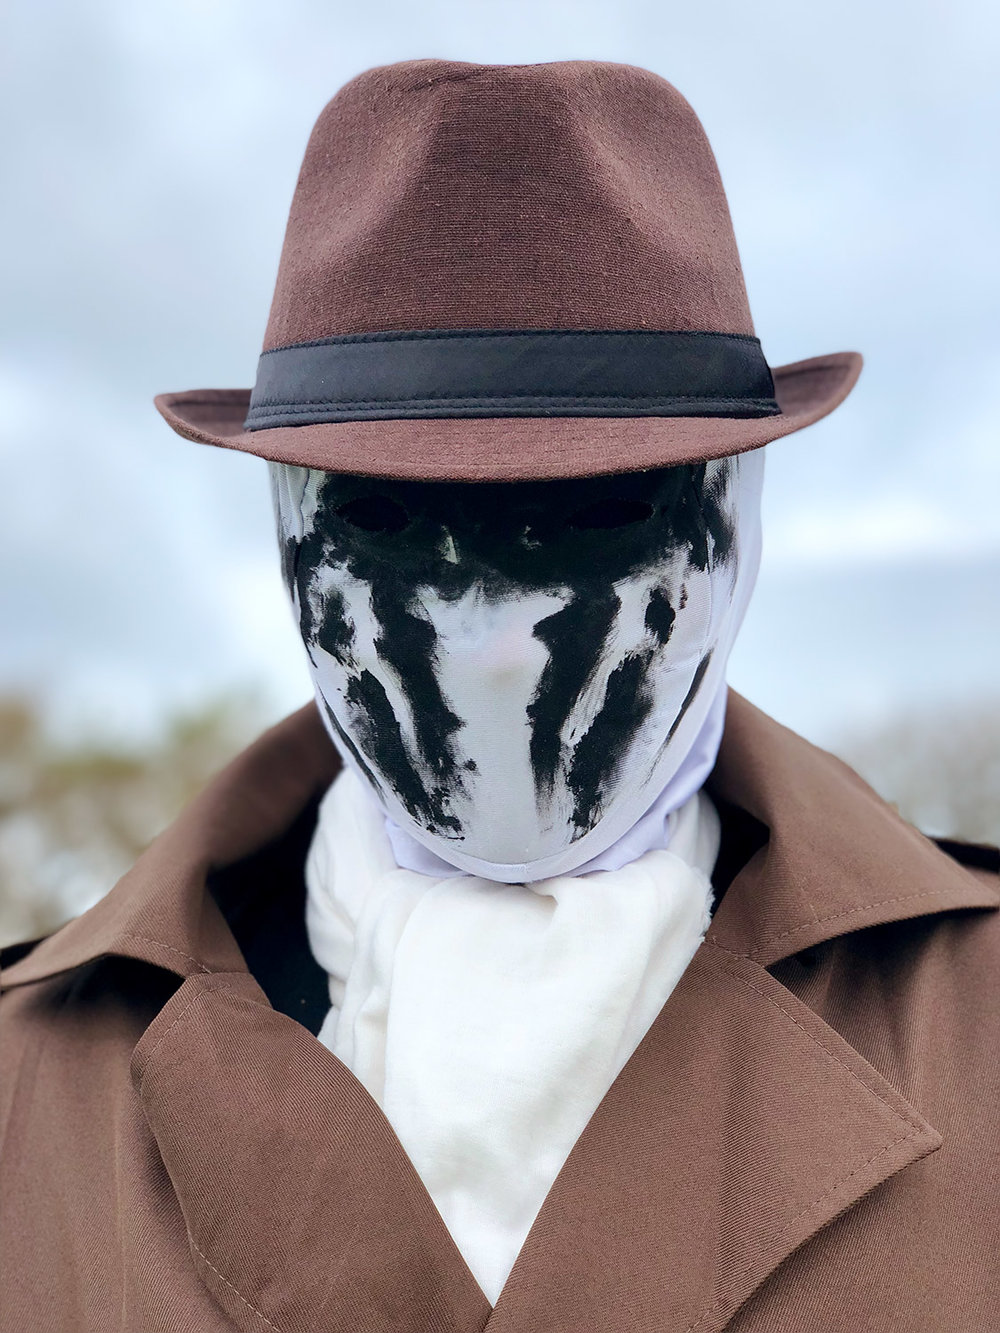 Man without face #ShotOniPhone #ShotOniPhoneX using portrait mode.